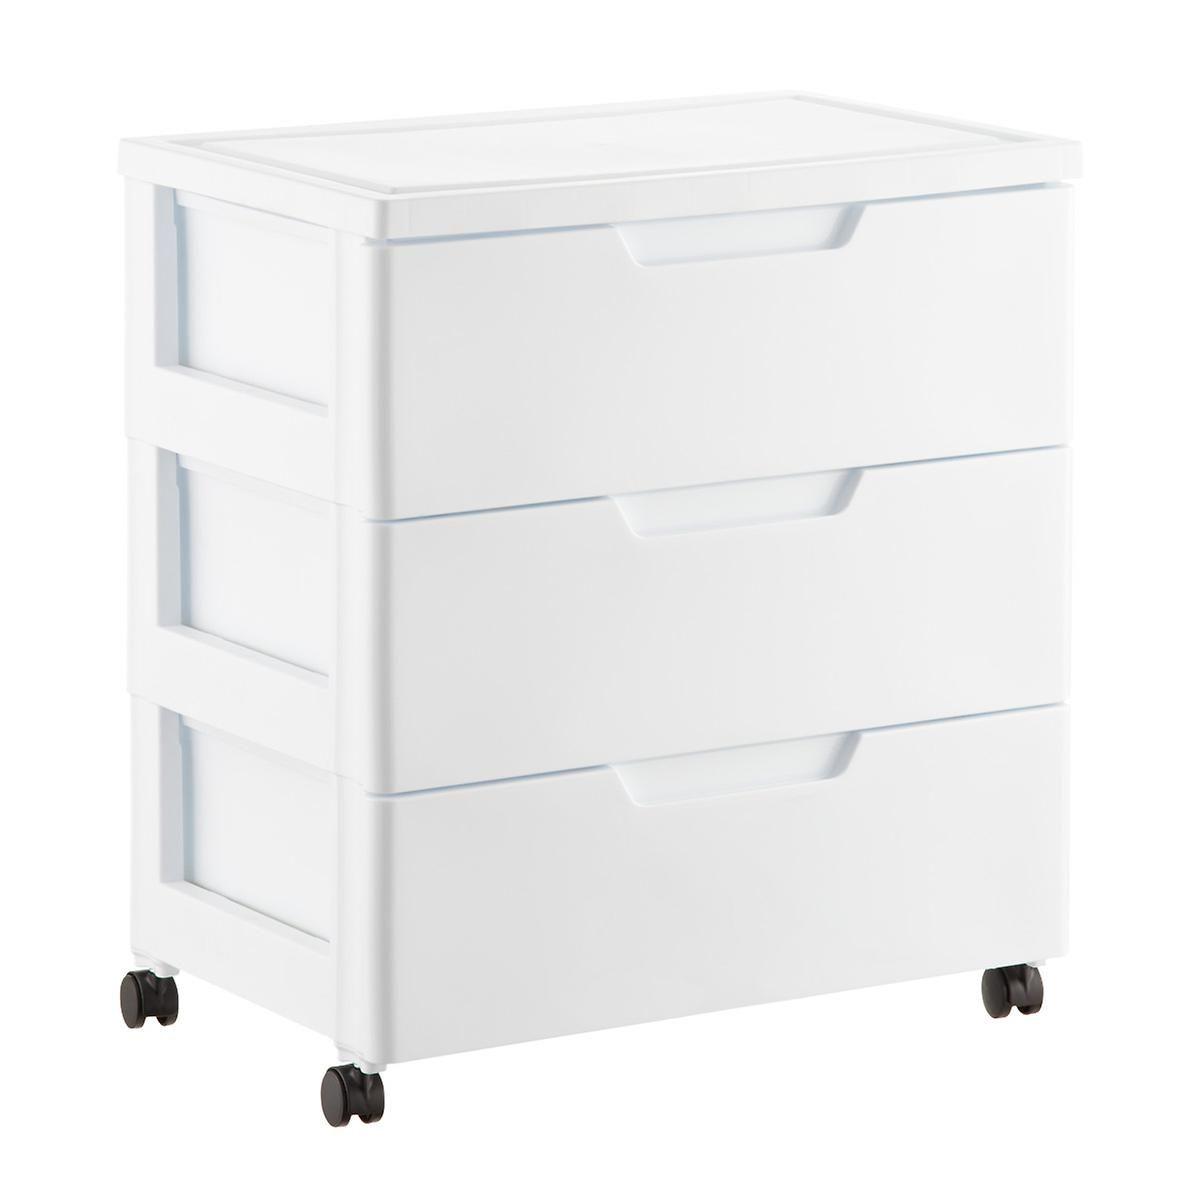 Childrens Animals Storage Box Chest 3 Kids Drawer Bedroom: Iris White 3-Drawer Premium Plastic Storage Chest With